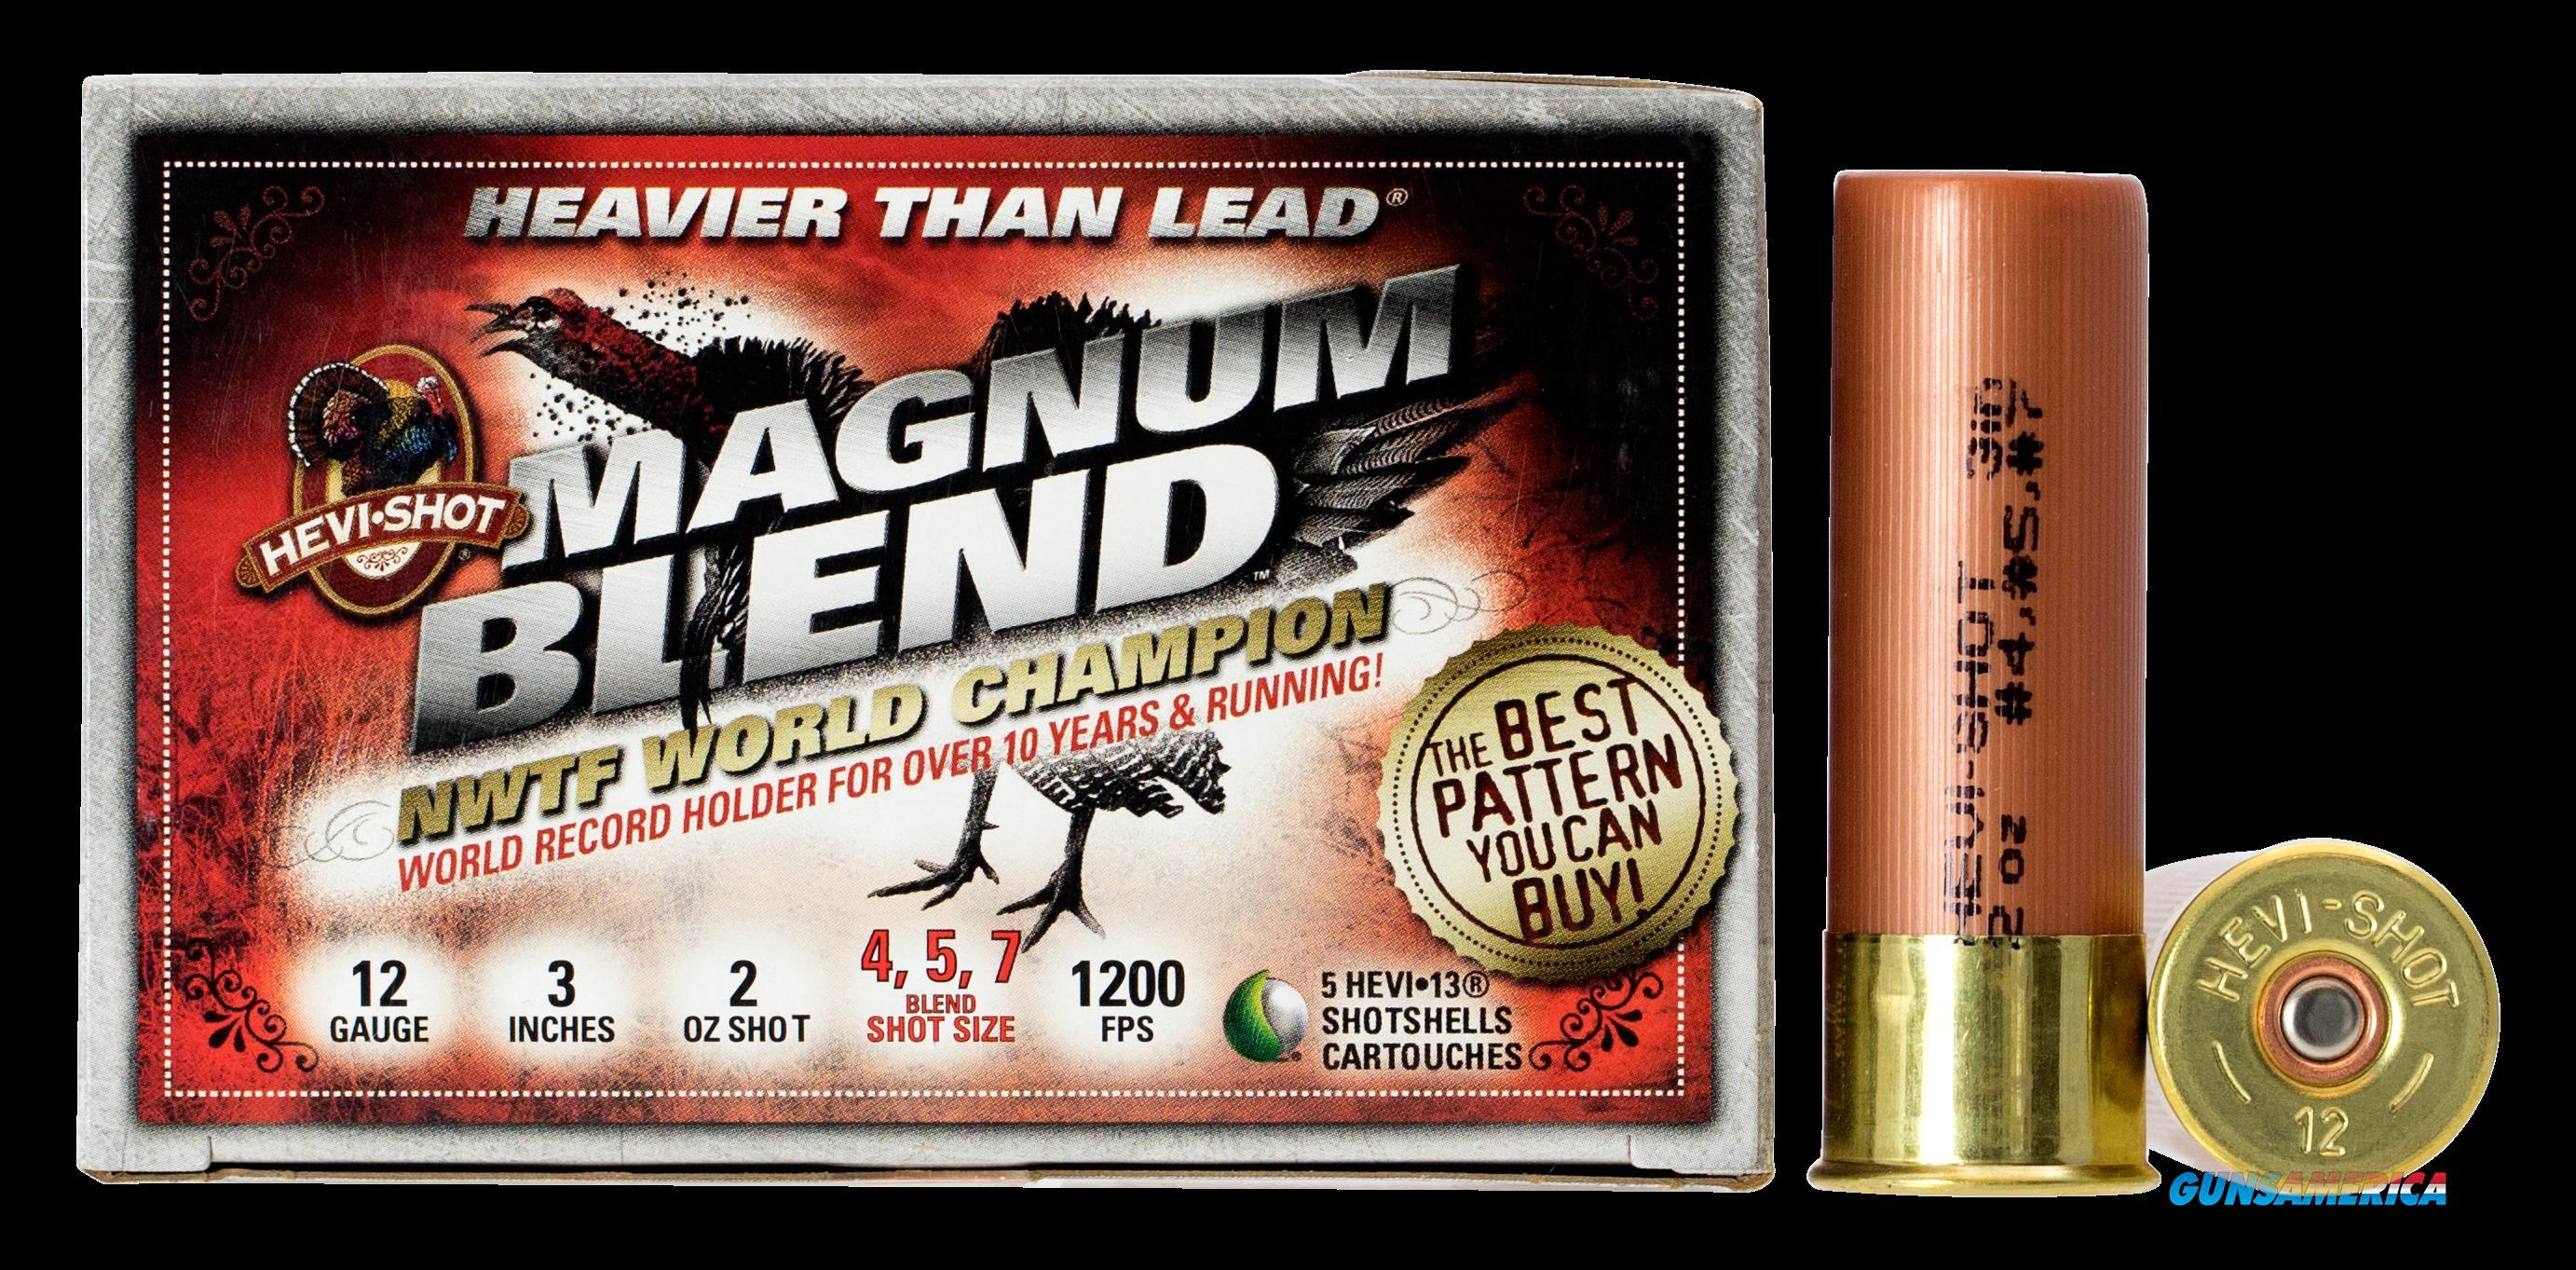 Hevishot Magnum Blend, Hevi 43457 Tky Mgblend  12 3  4,5,7 2oz  5-10  Guns > Pistols > 1911 Pistol Copies (non-Colt)